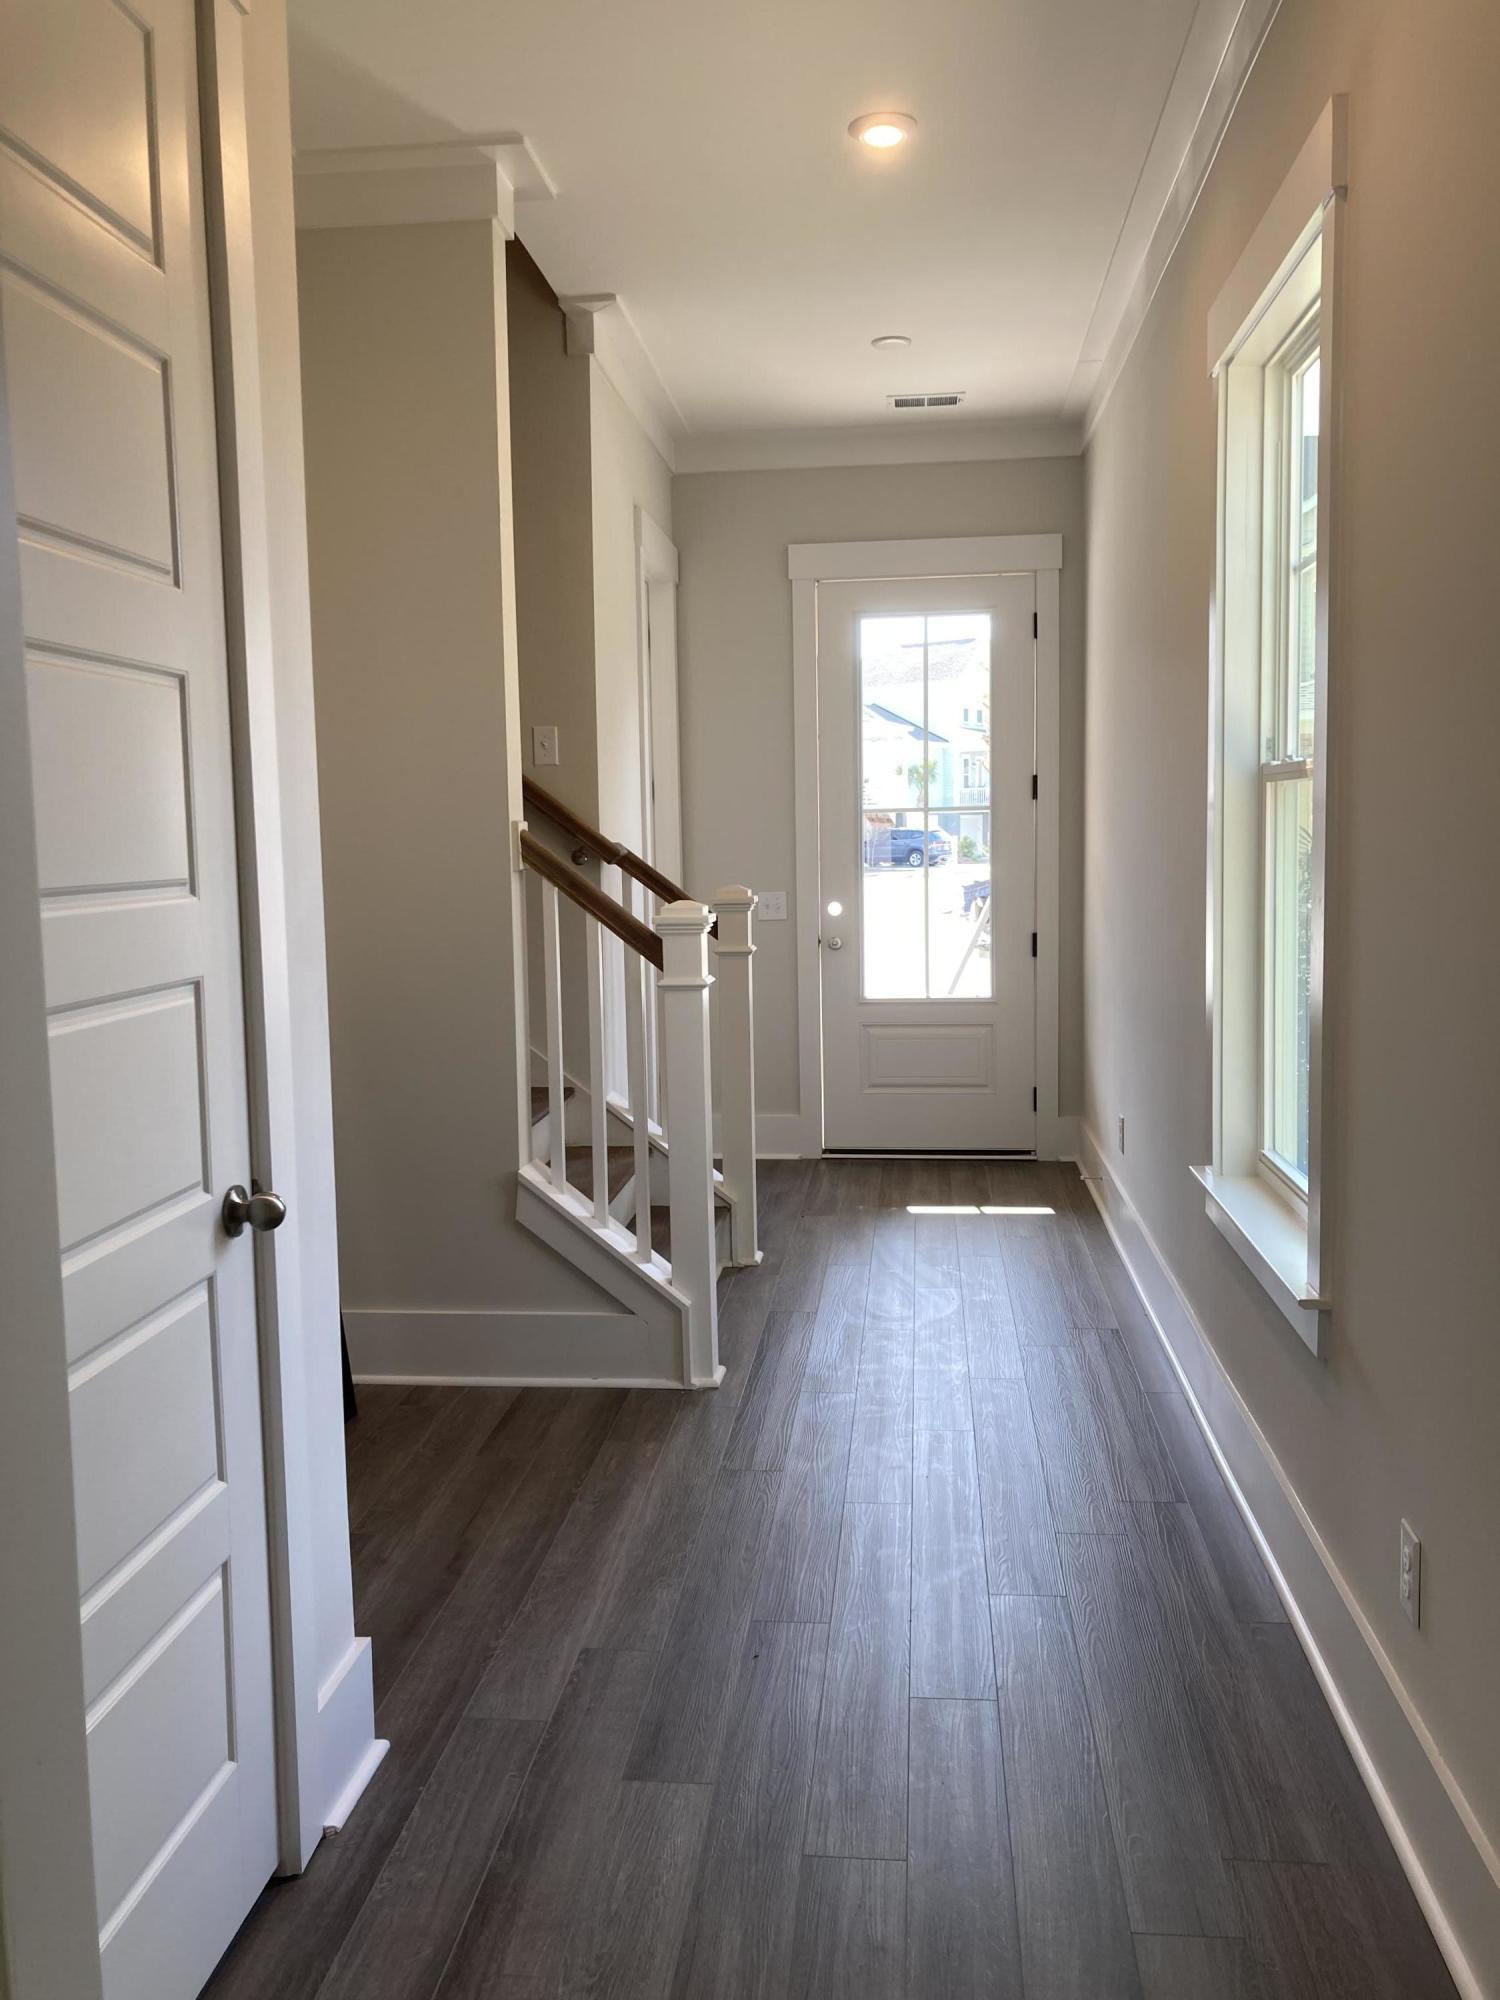 Fulton Park Homes For Sale - 1264 Max, Mount Pleasant, SC - 35